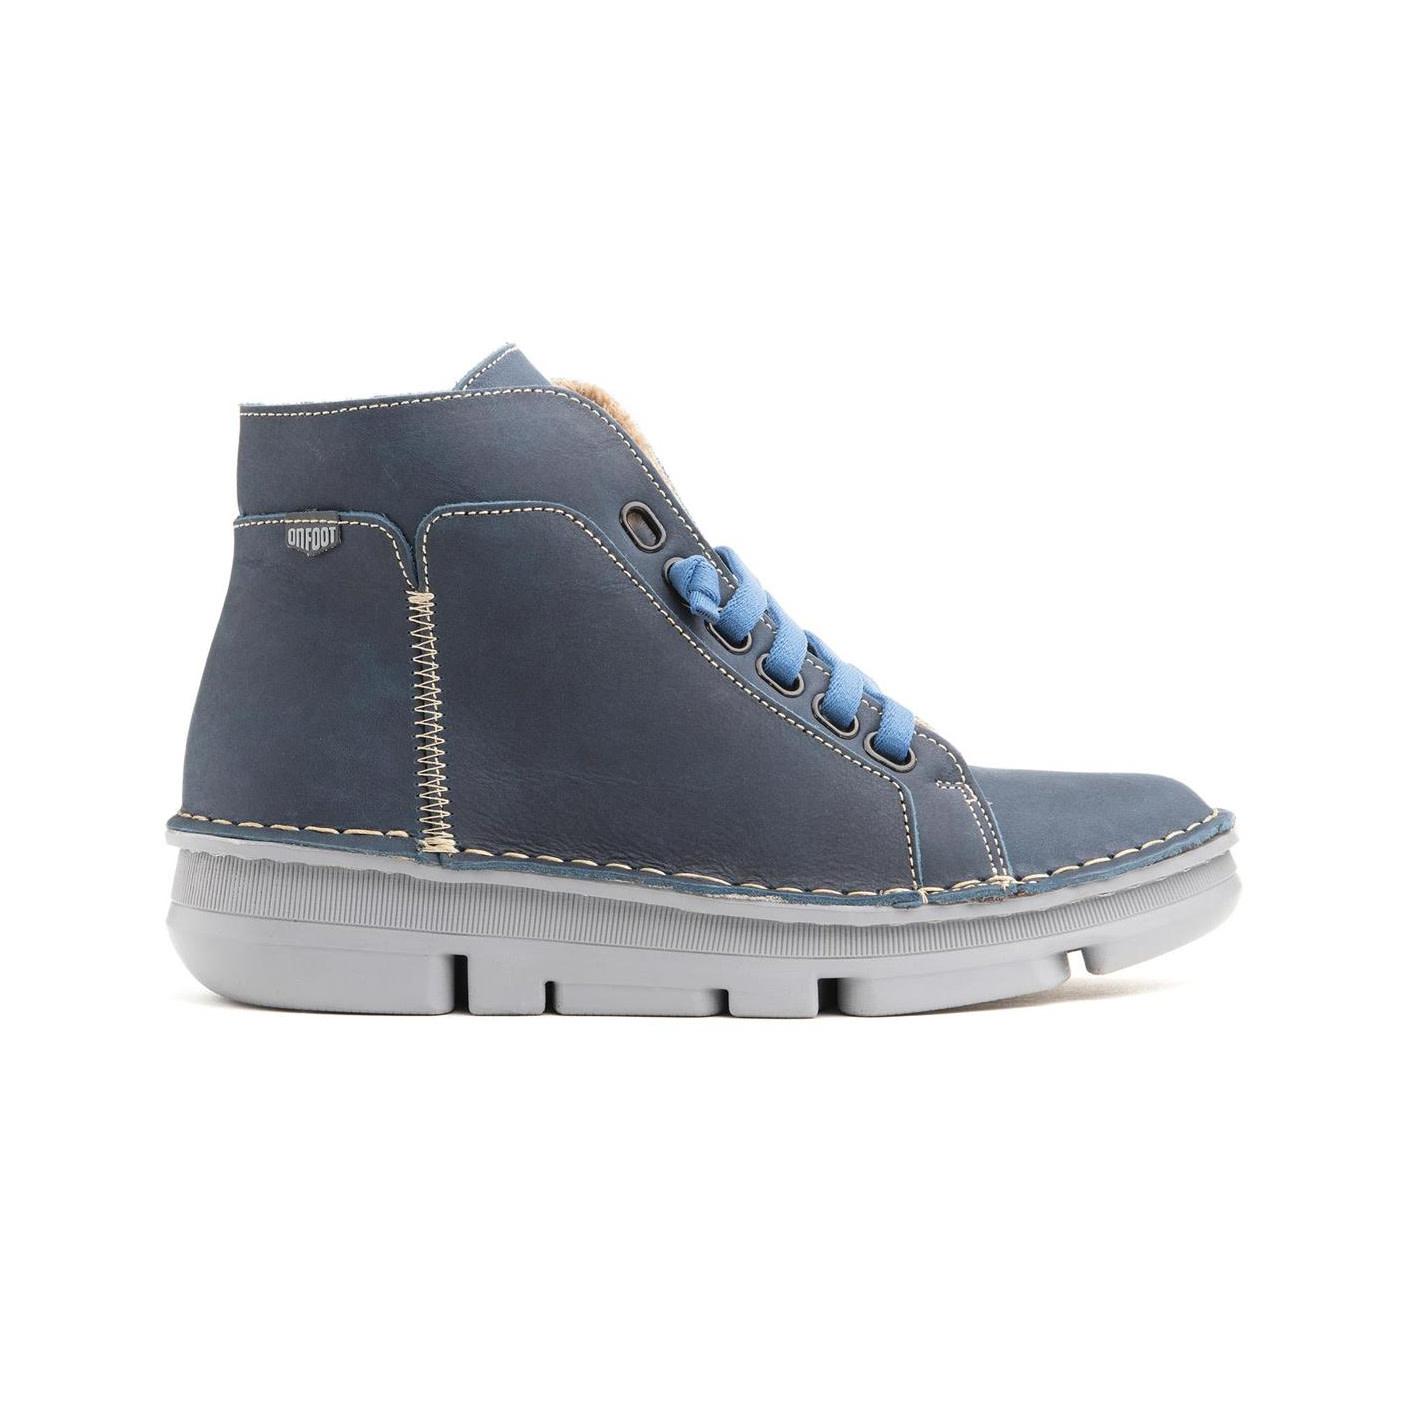 On Foot On Foot - 29001 Women boots - Navy